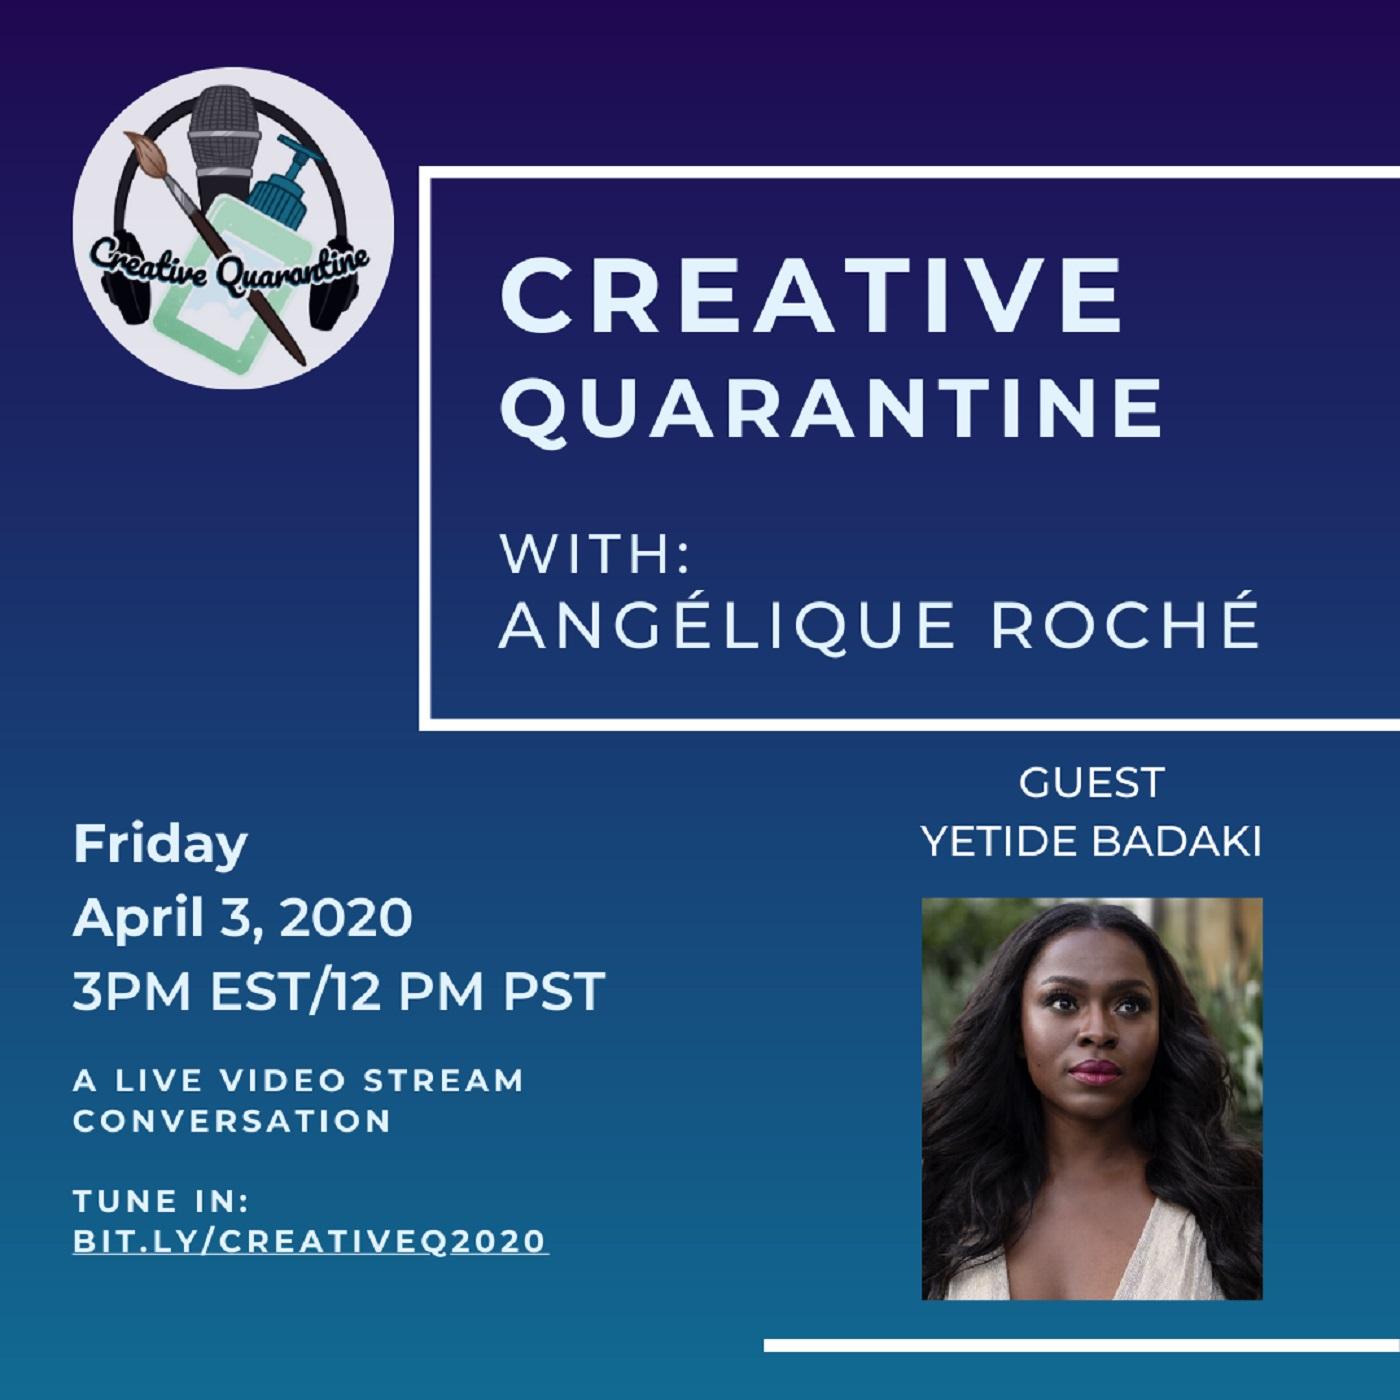 Creative Quarantine - Episode 10: Actress/Producer Yetide Badaki